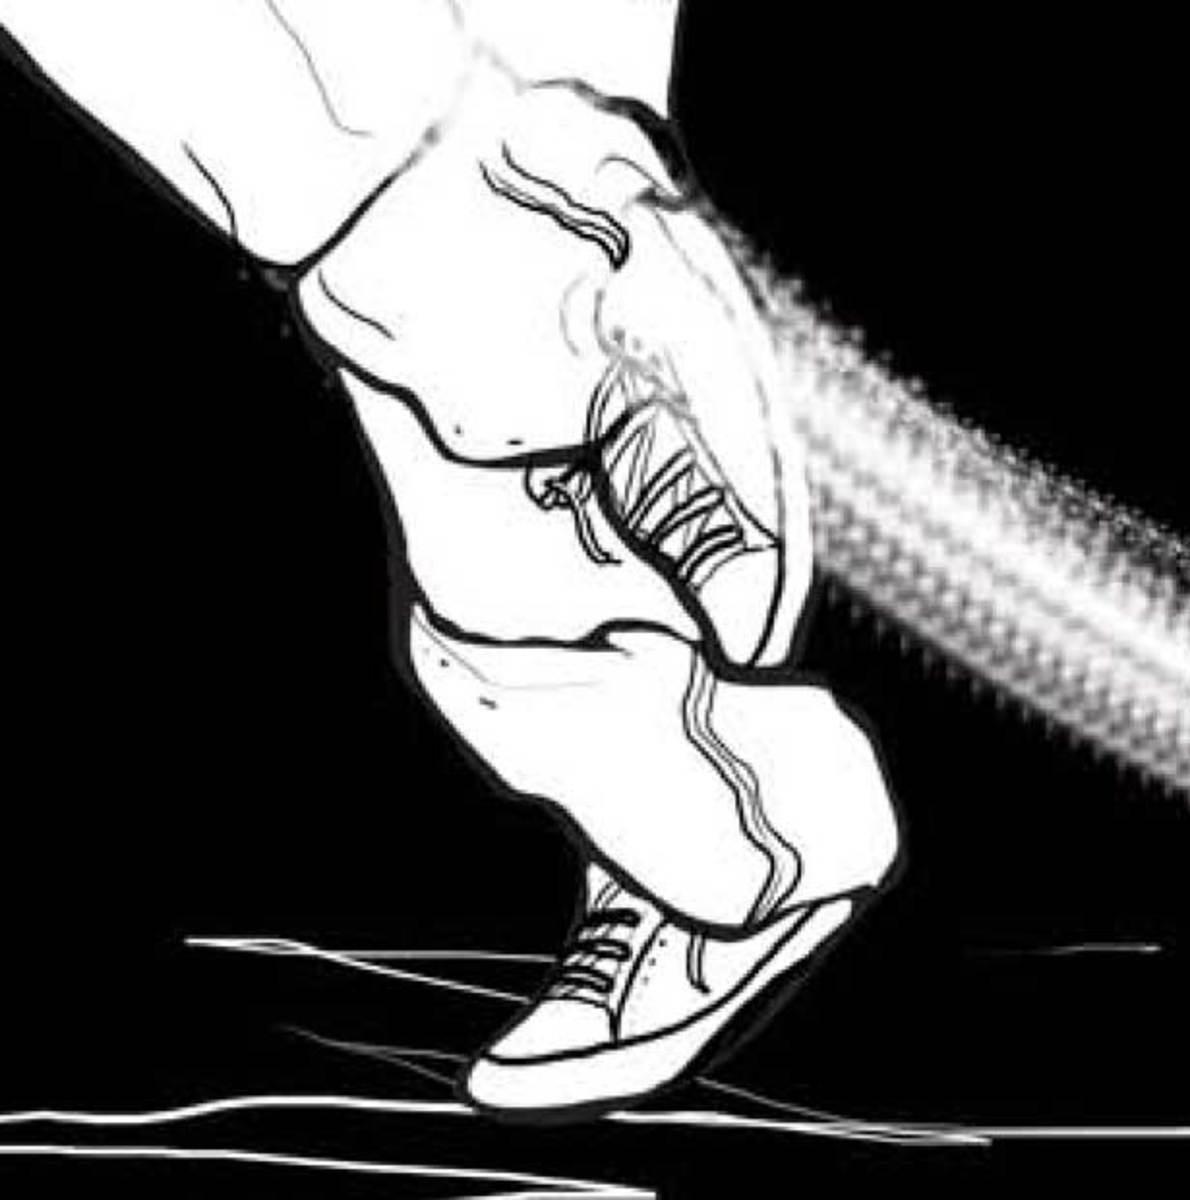 Spannered-Chapter-06-illustration-detail